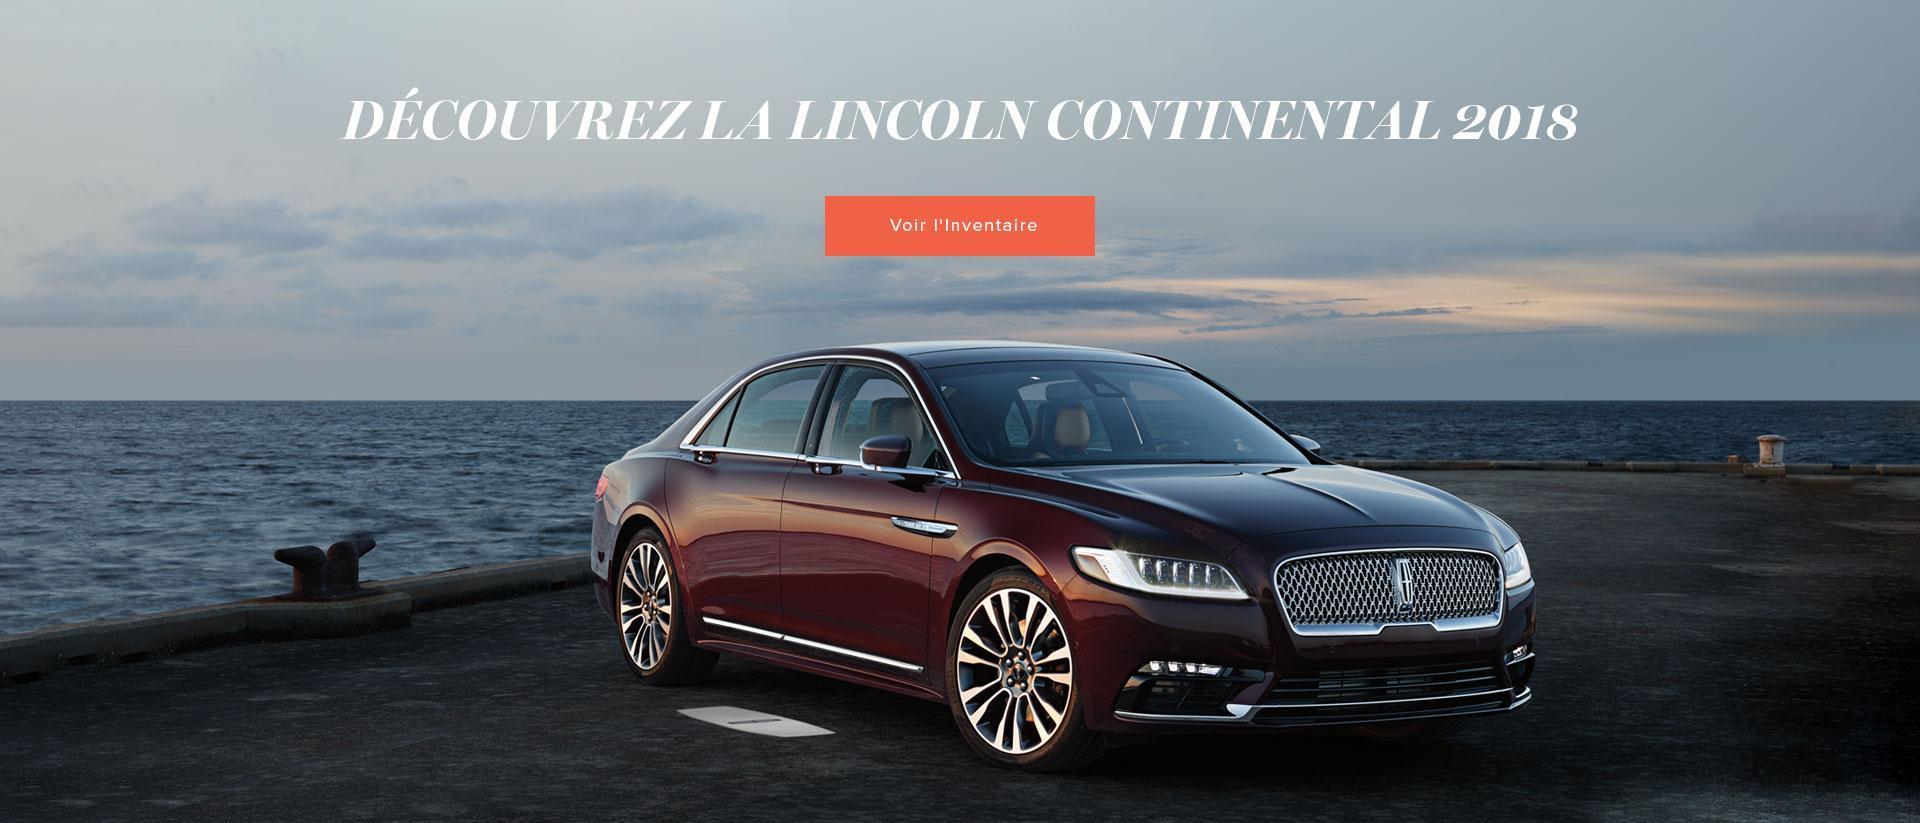 2018 Lincoln Continental